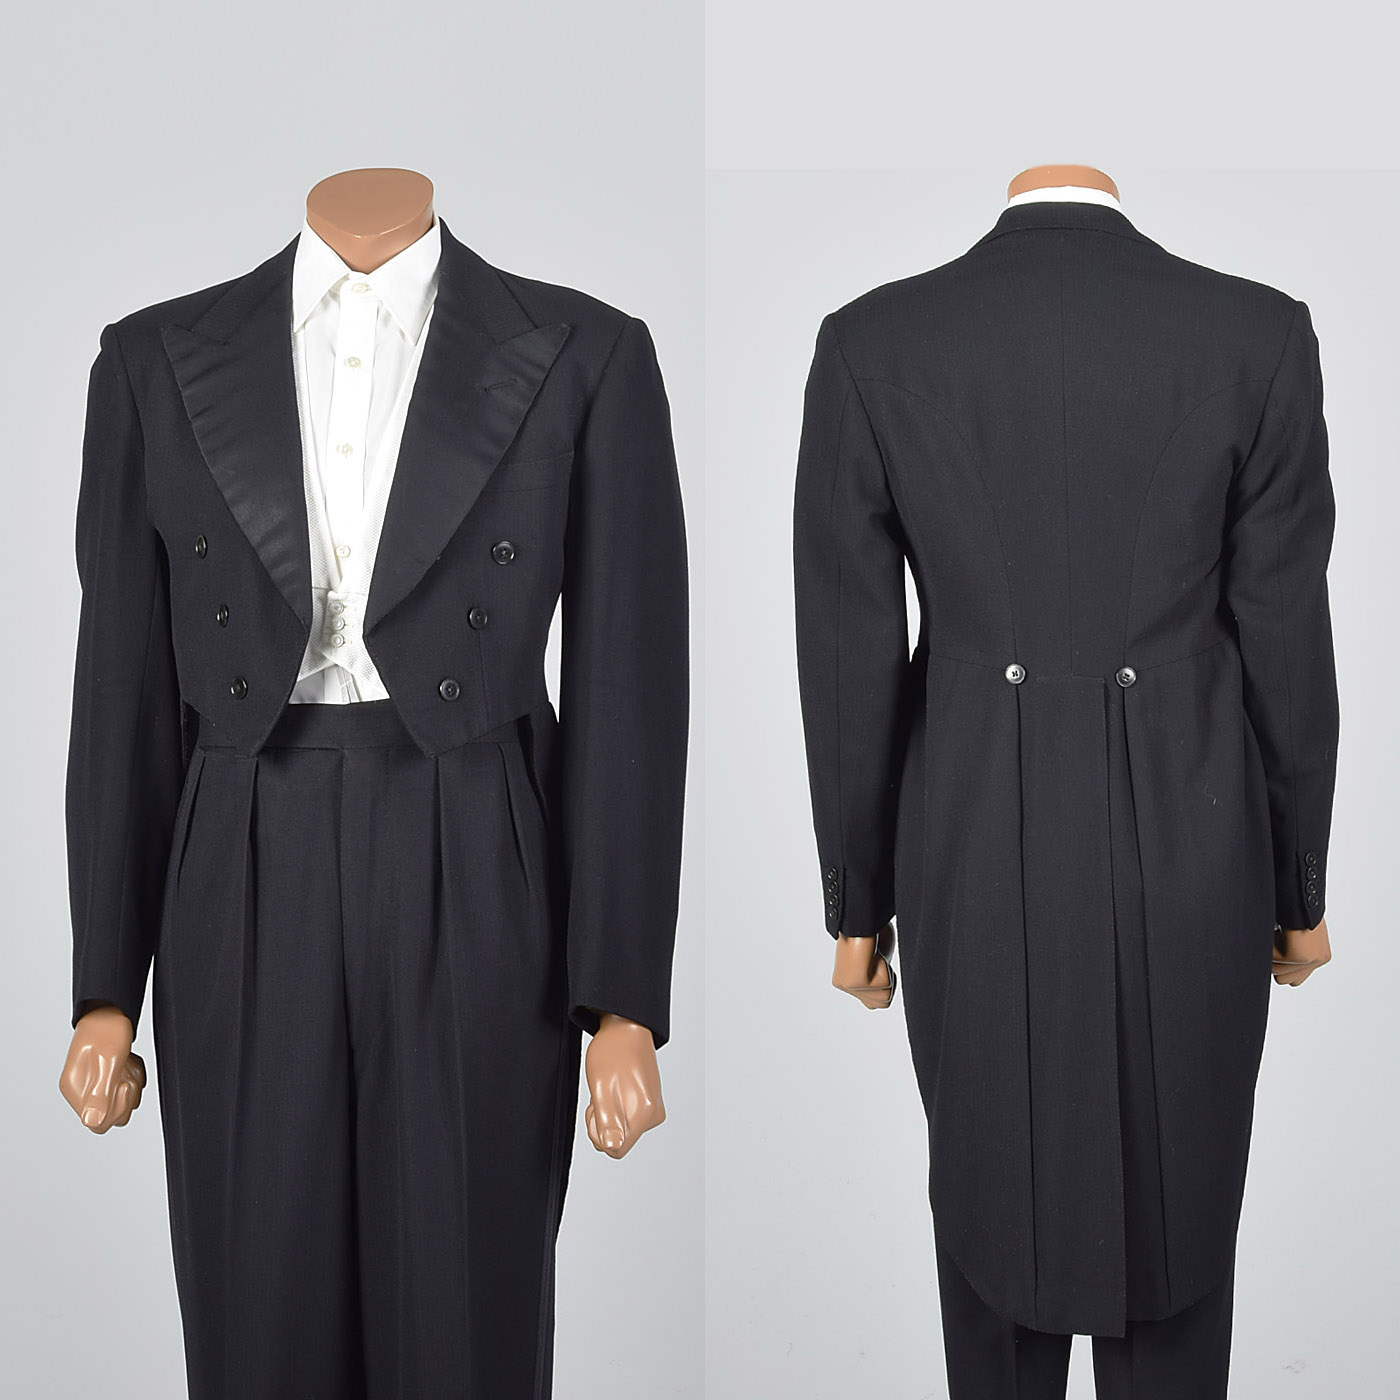 38 1950s Men Savile Row Tuxedo Black Tie White Tie Formal Evening ...